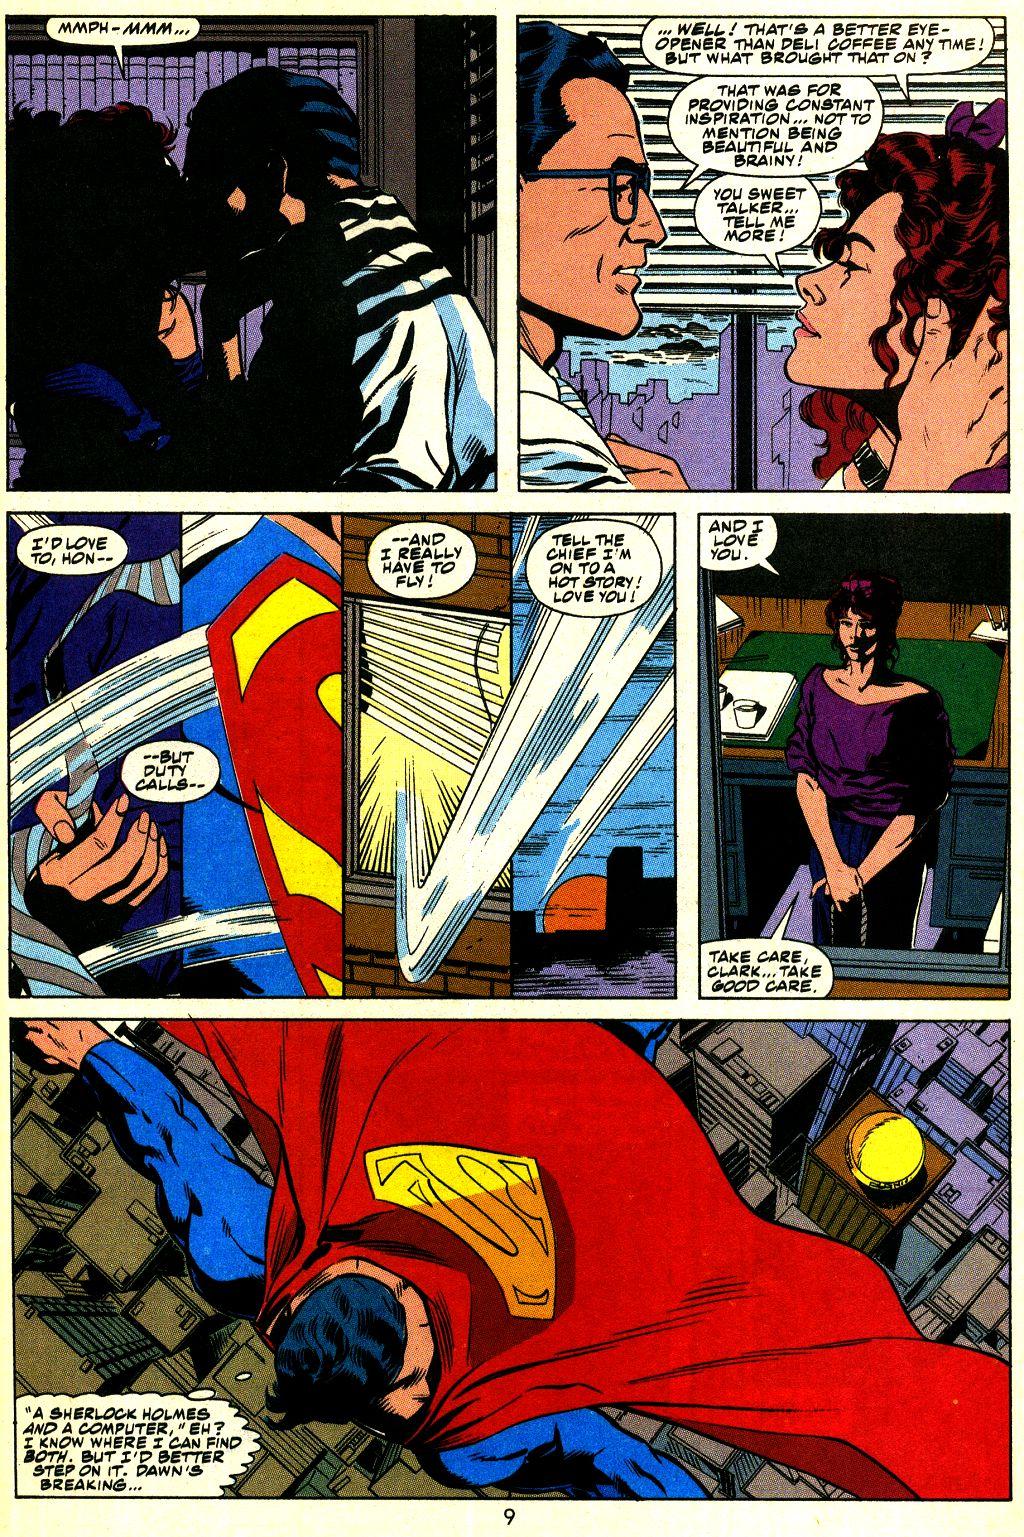 Action Comics (1938) 683 Page 9